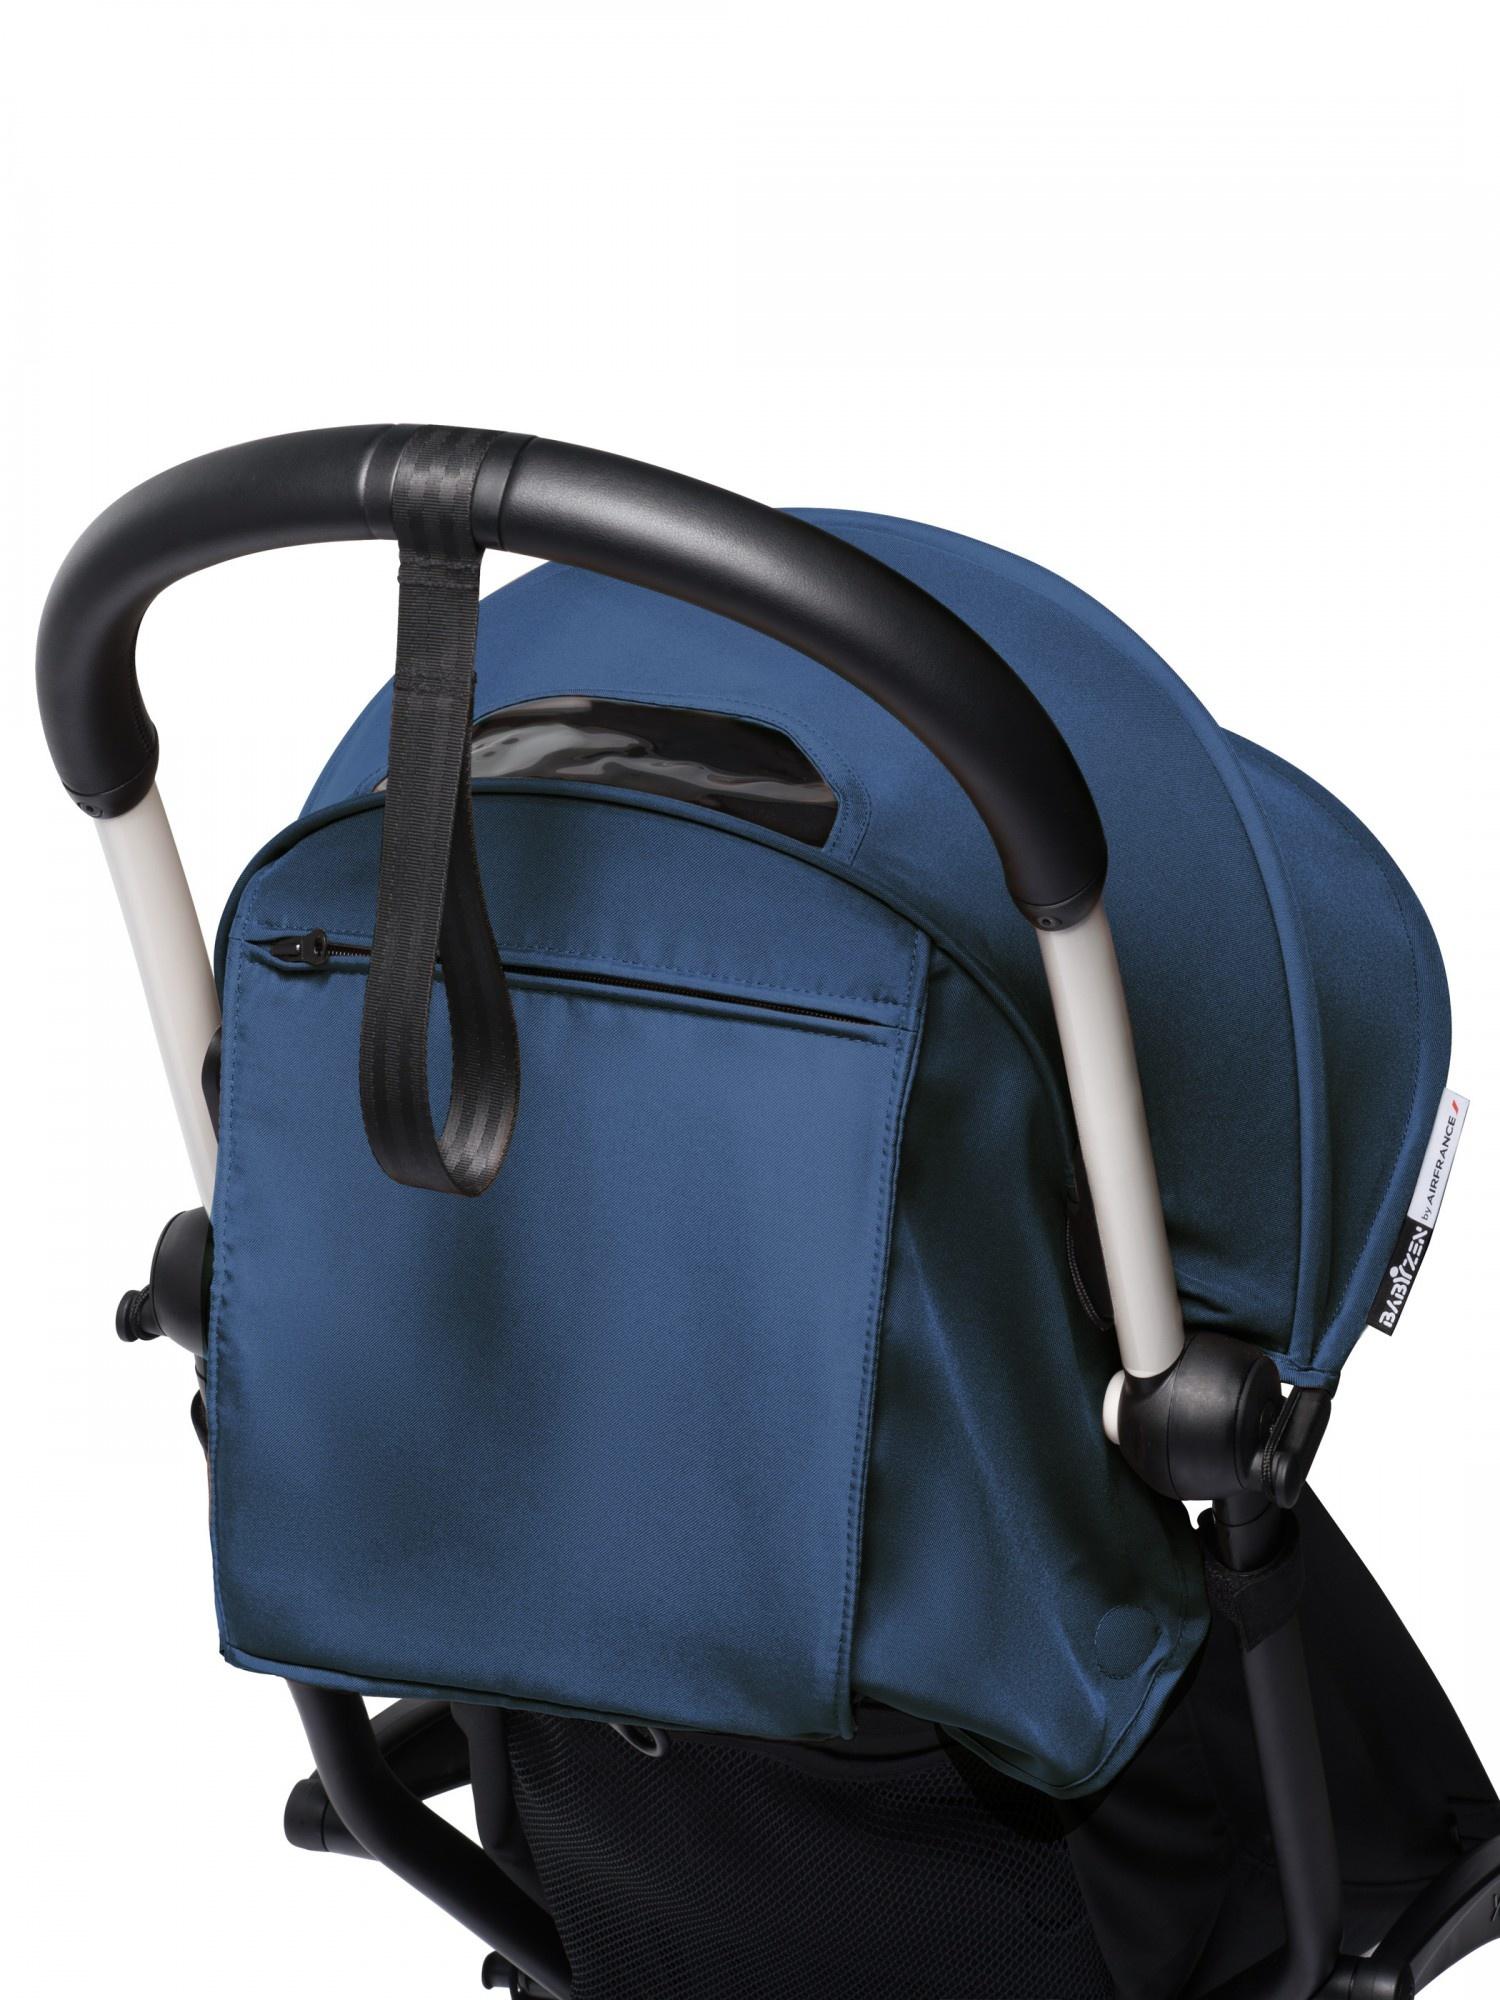 Babyzen Babyzen YOYO² buggy COMPLEET / FULL SET 0+ and 6+ navy AirFrance frame wit incl. YOYO² BeSafe autostoel zwart